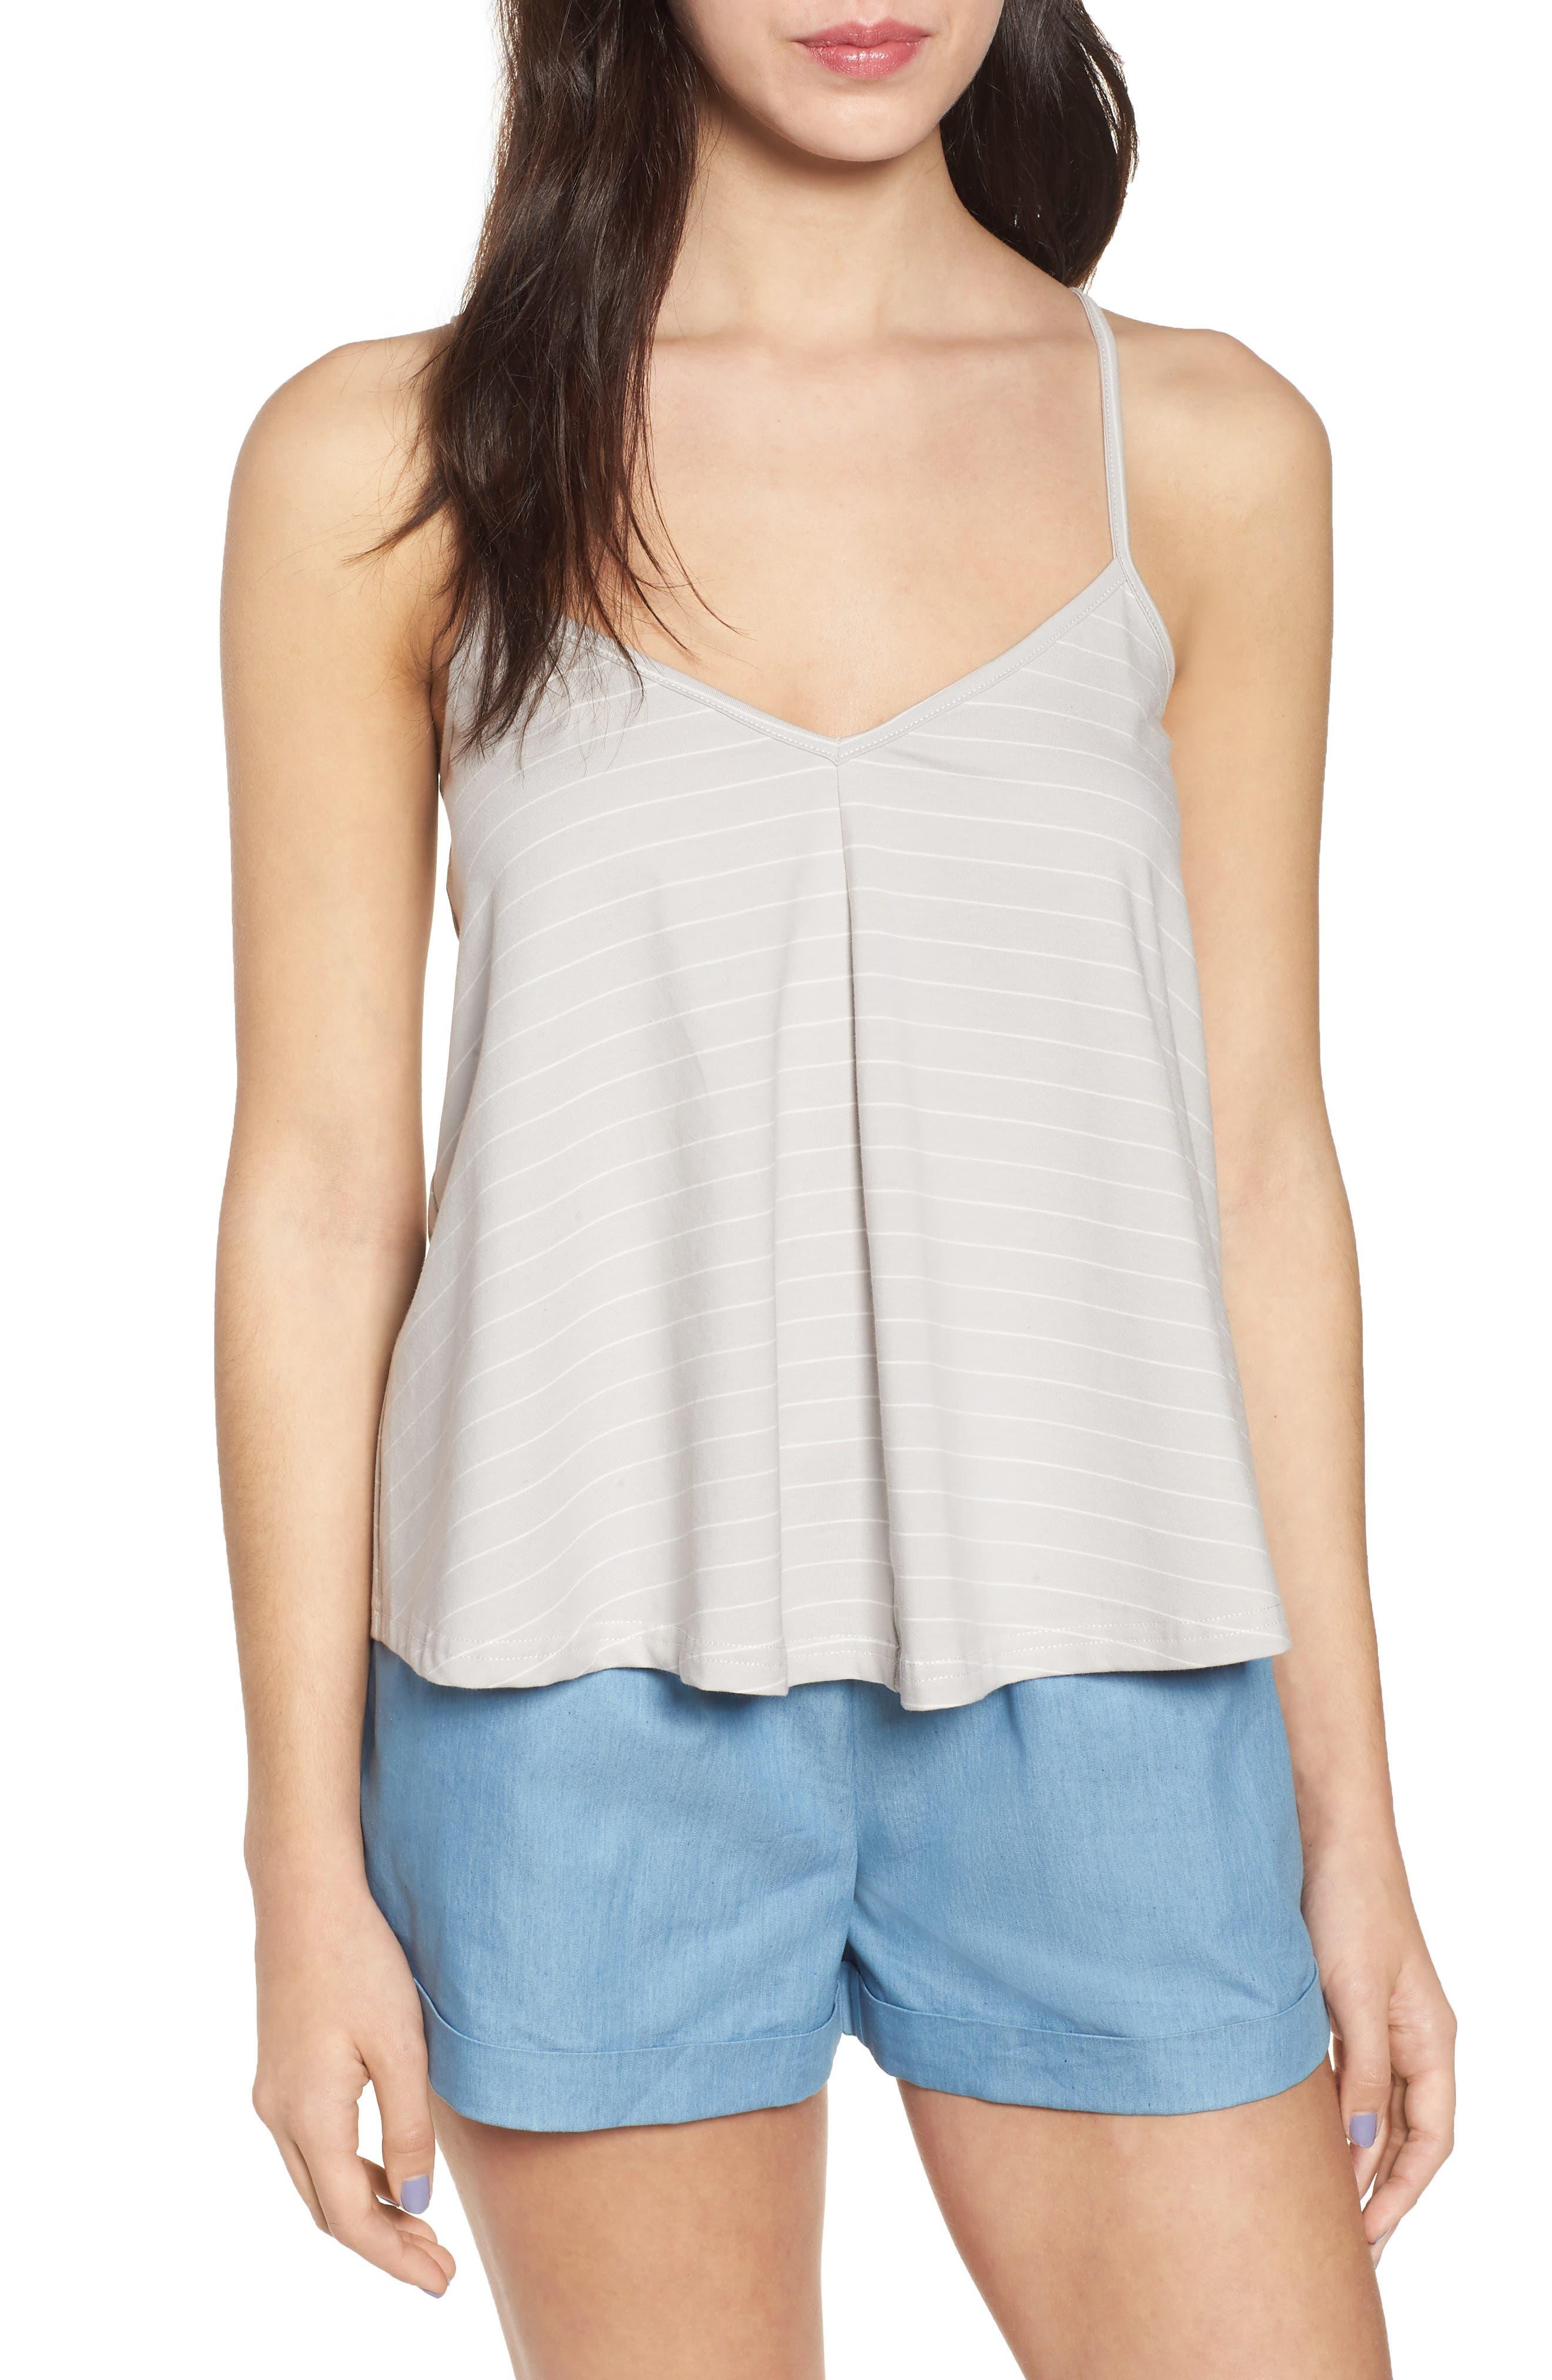 Lira Clothing Harlow Stripe Camisole Top